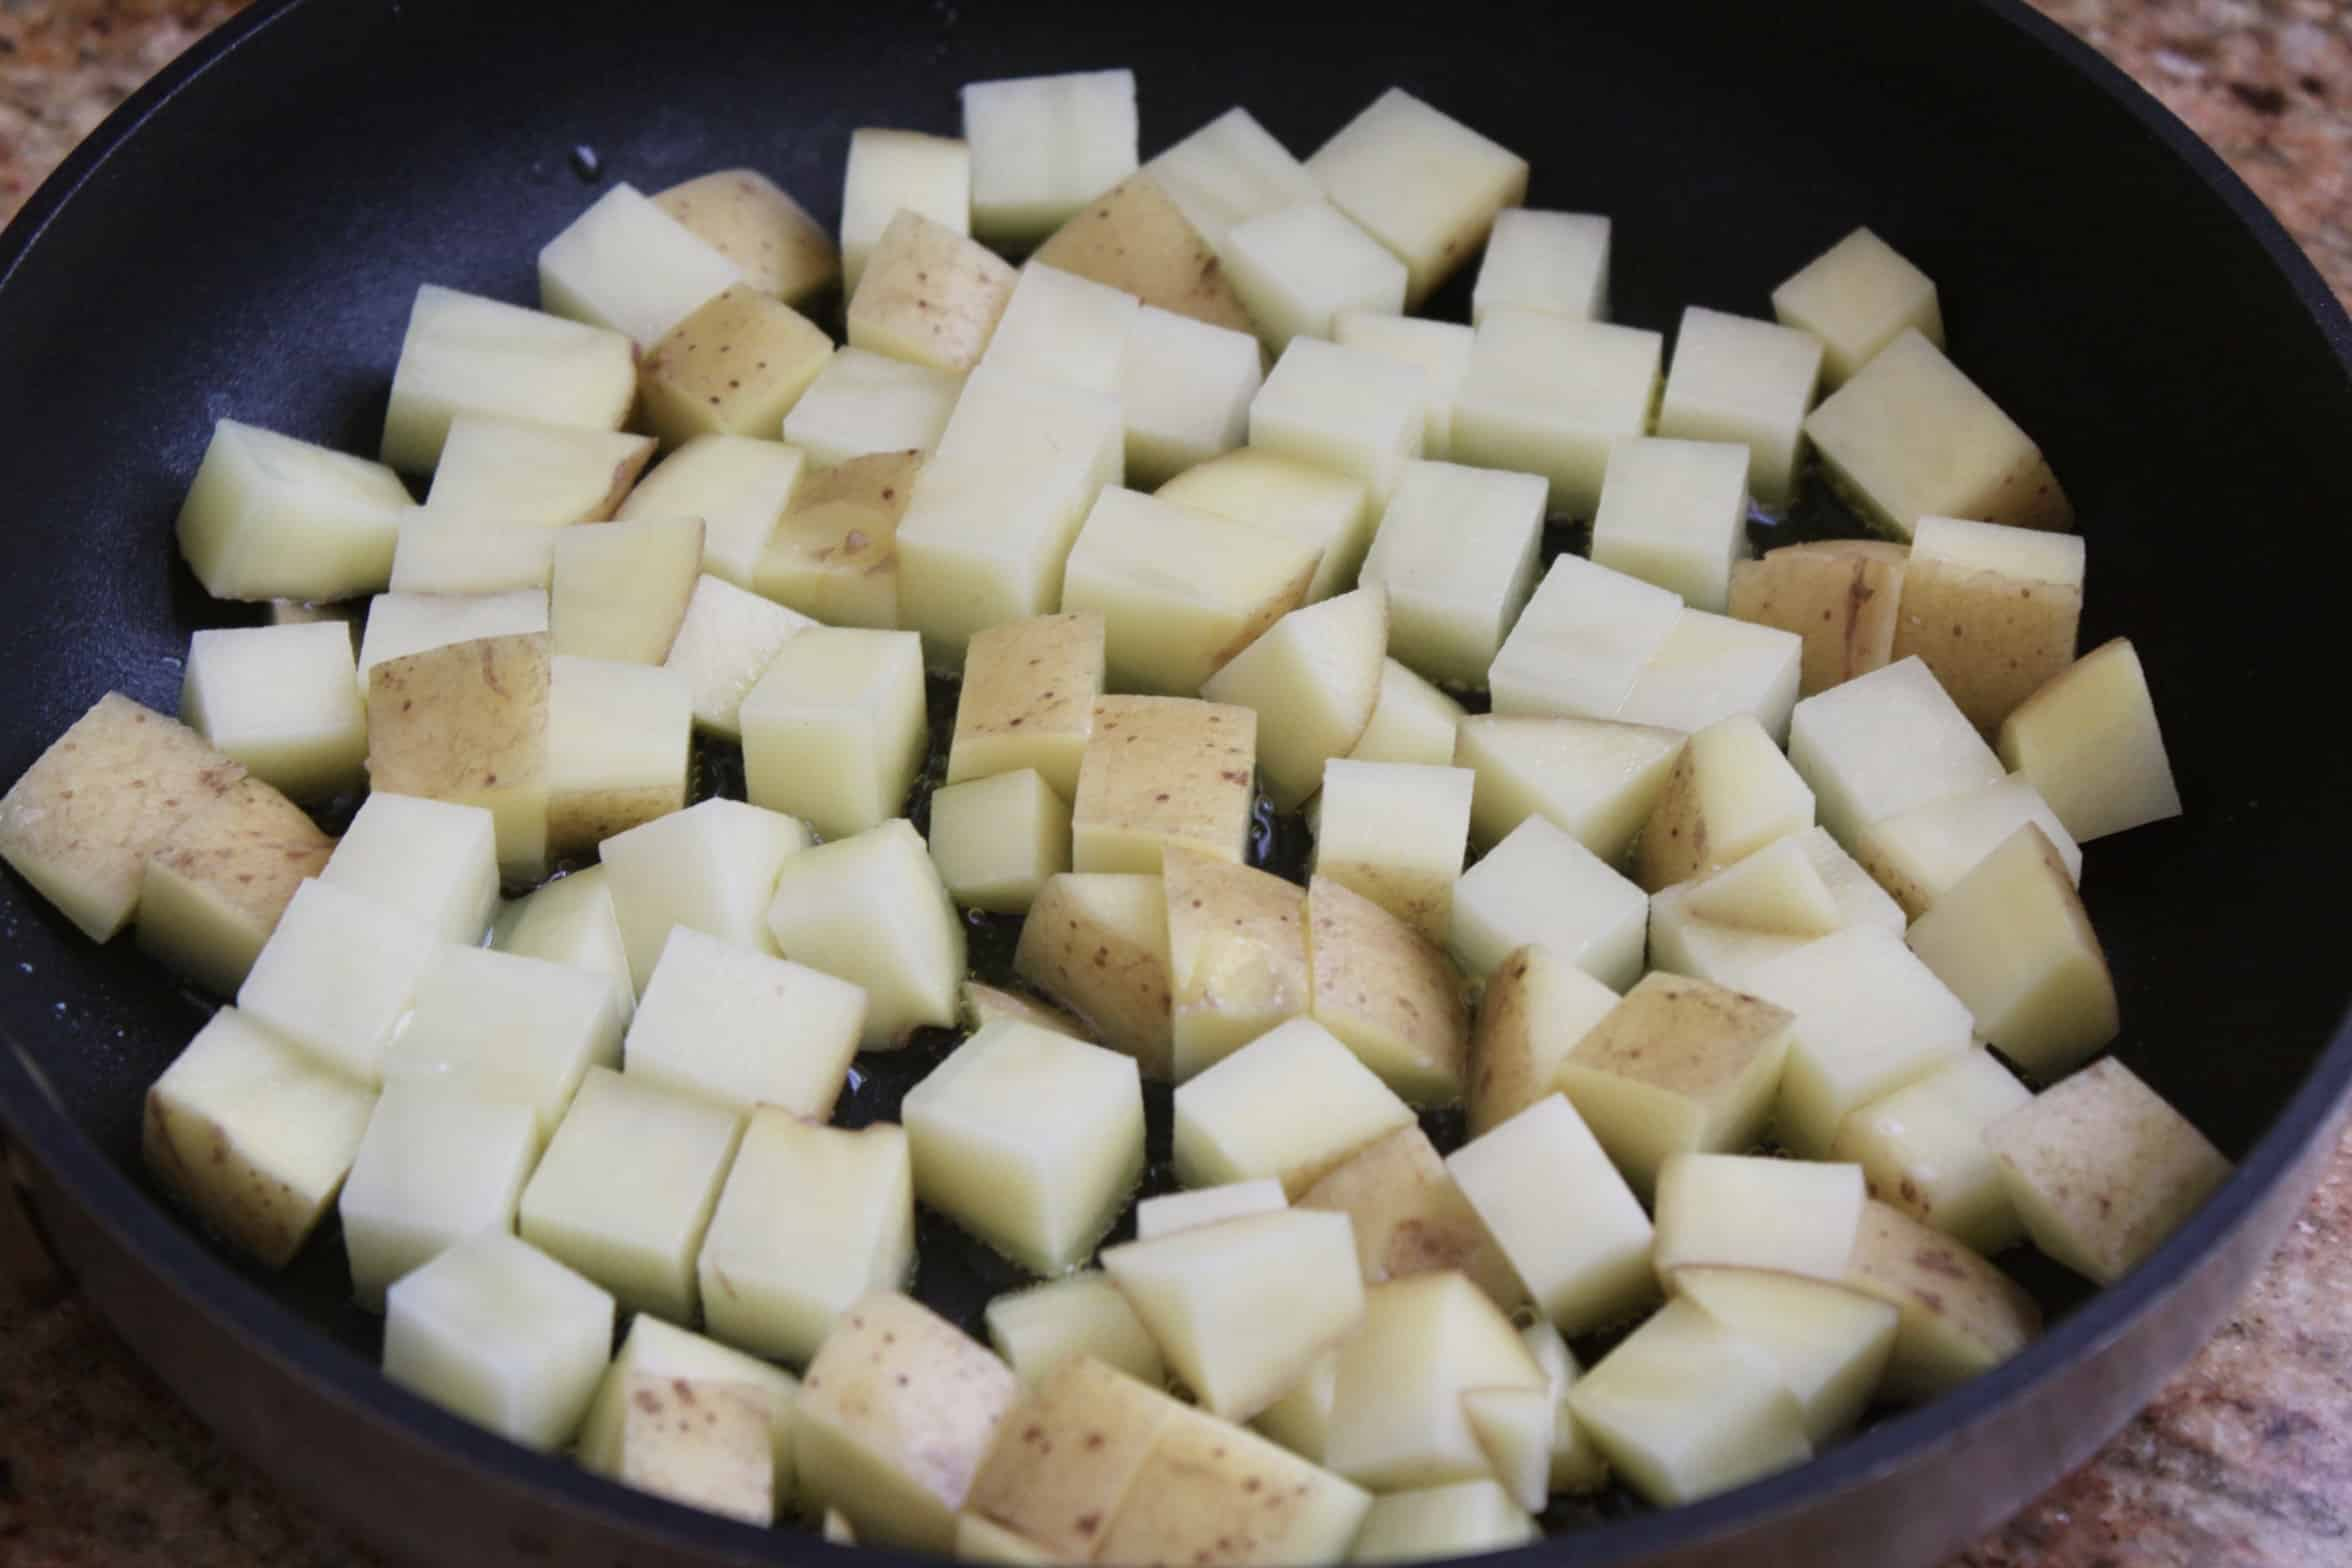 frying diced potatoes